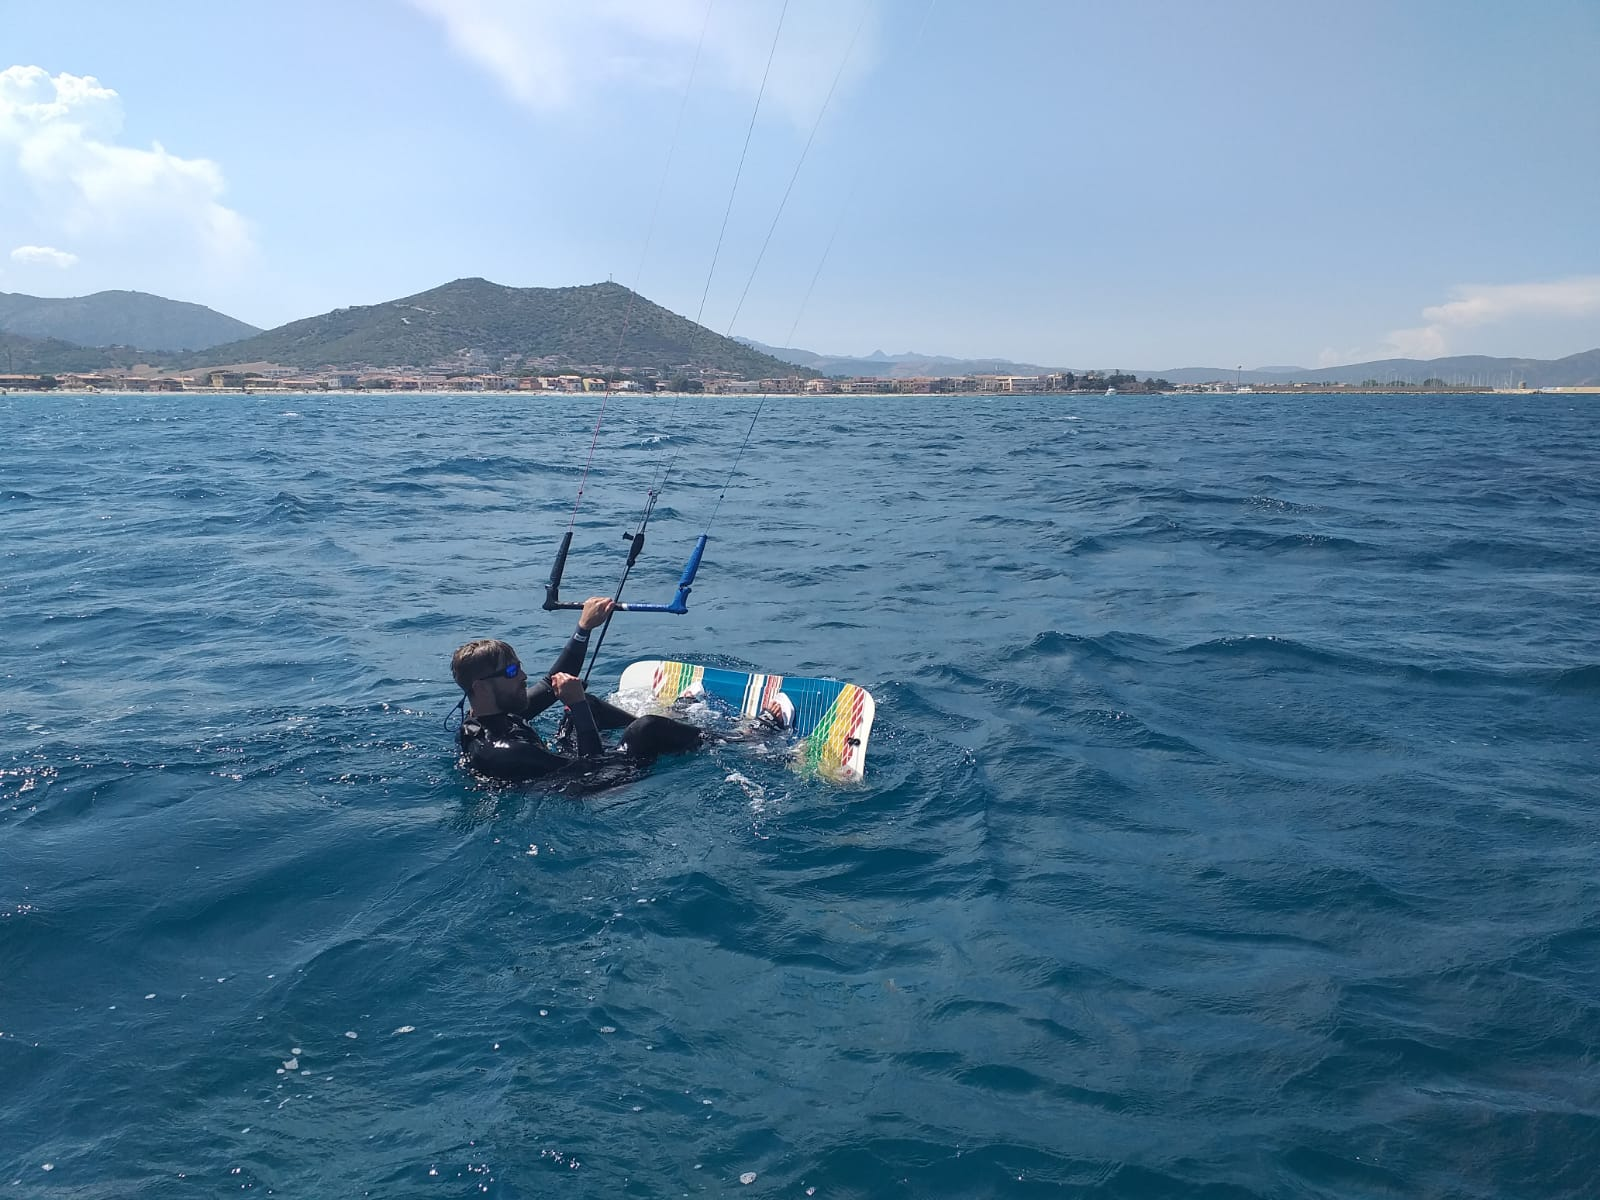 Progression kitesurf course in Castelldefels, Barcelona, Spain